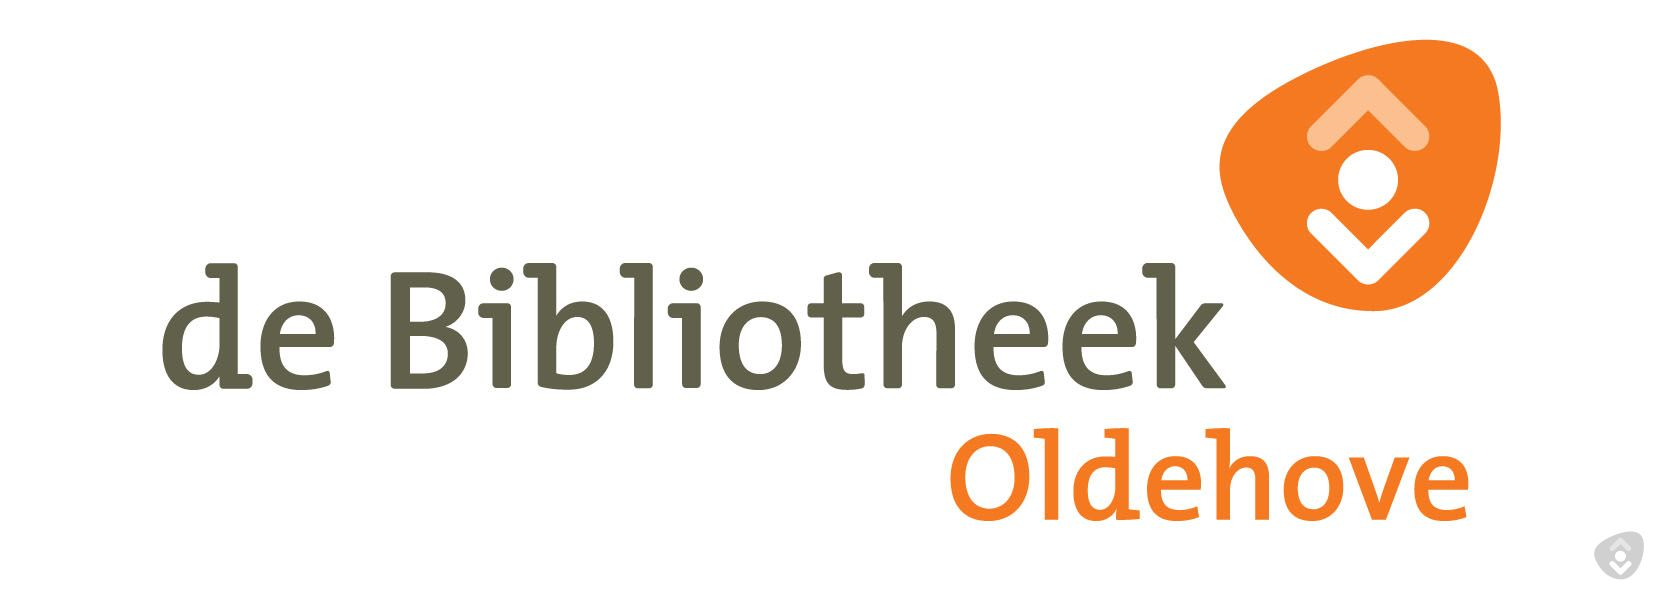 Biblio_lang_RGB_Oldehove.jpg (49536 bytes)